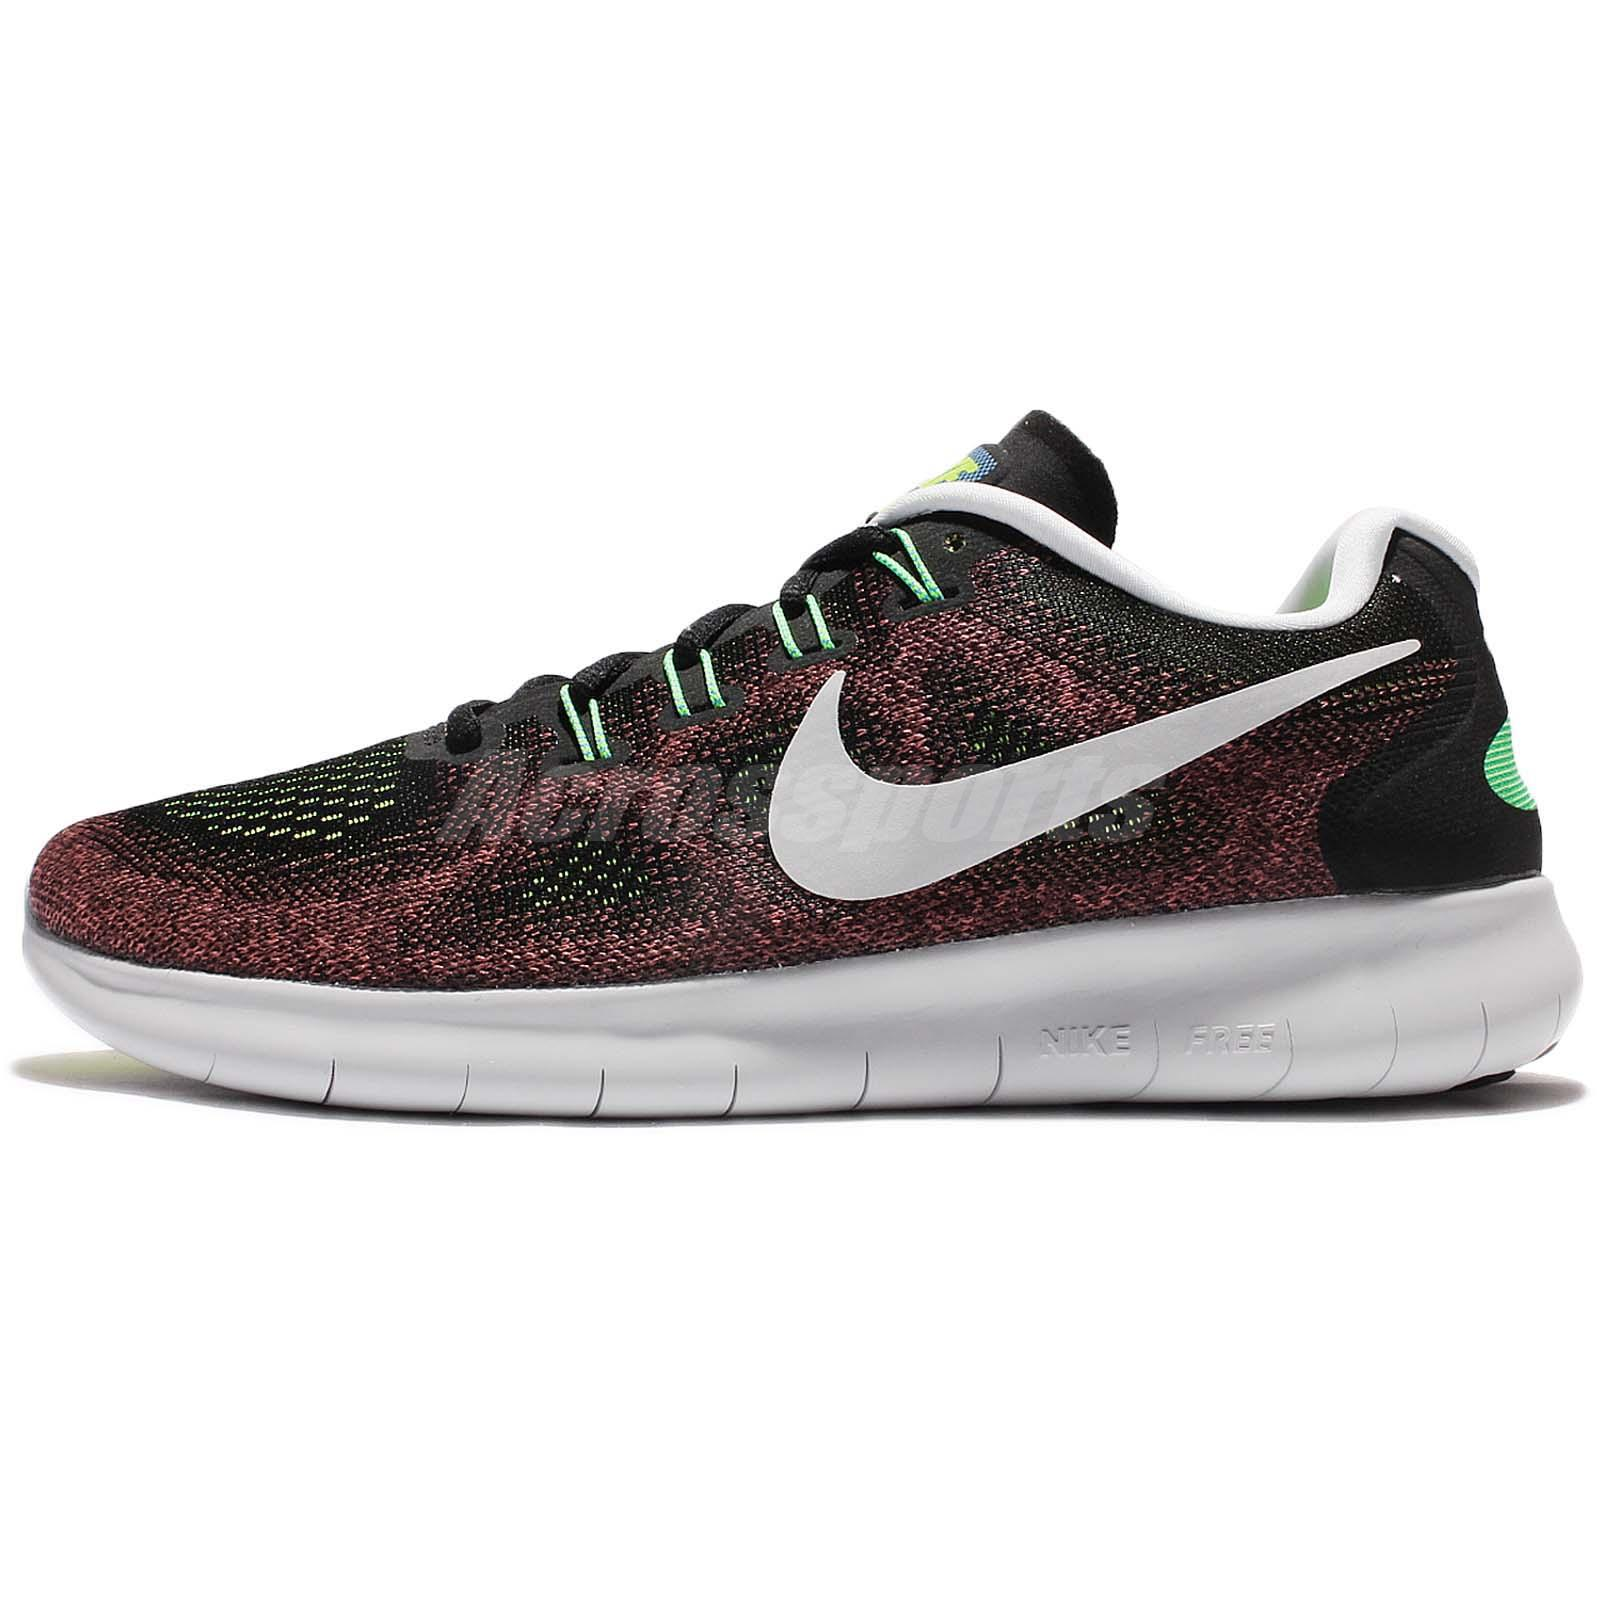 2b8075686845 hot punch nike free run Nike Air Presto Fly ...